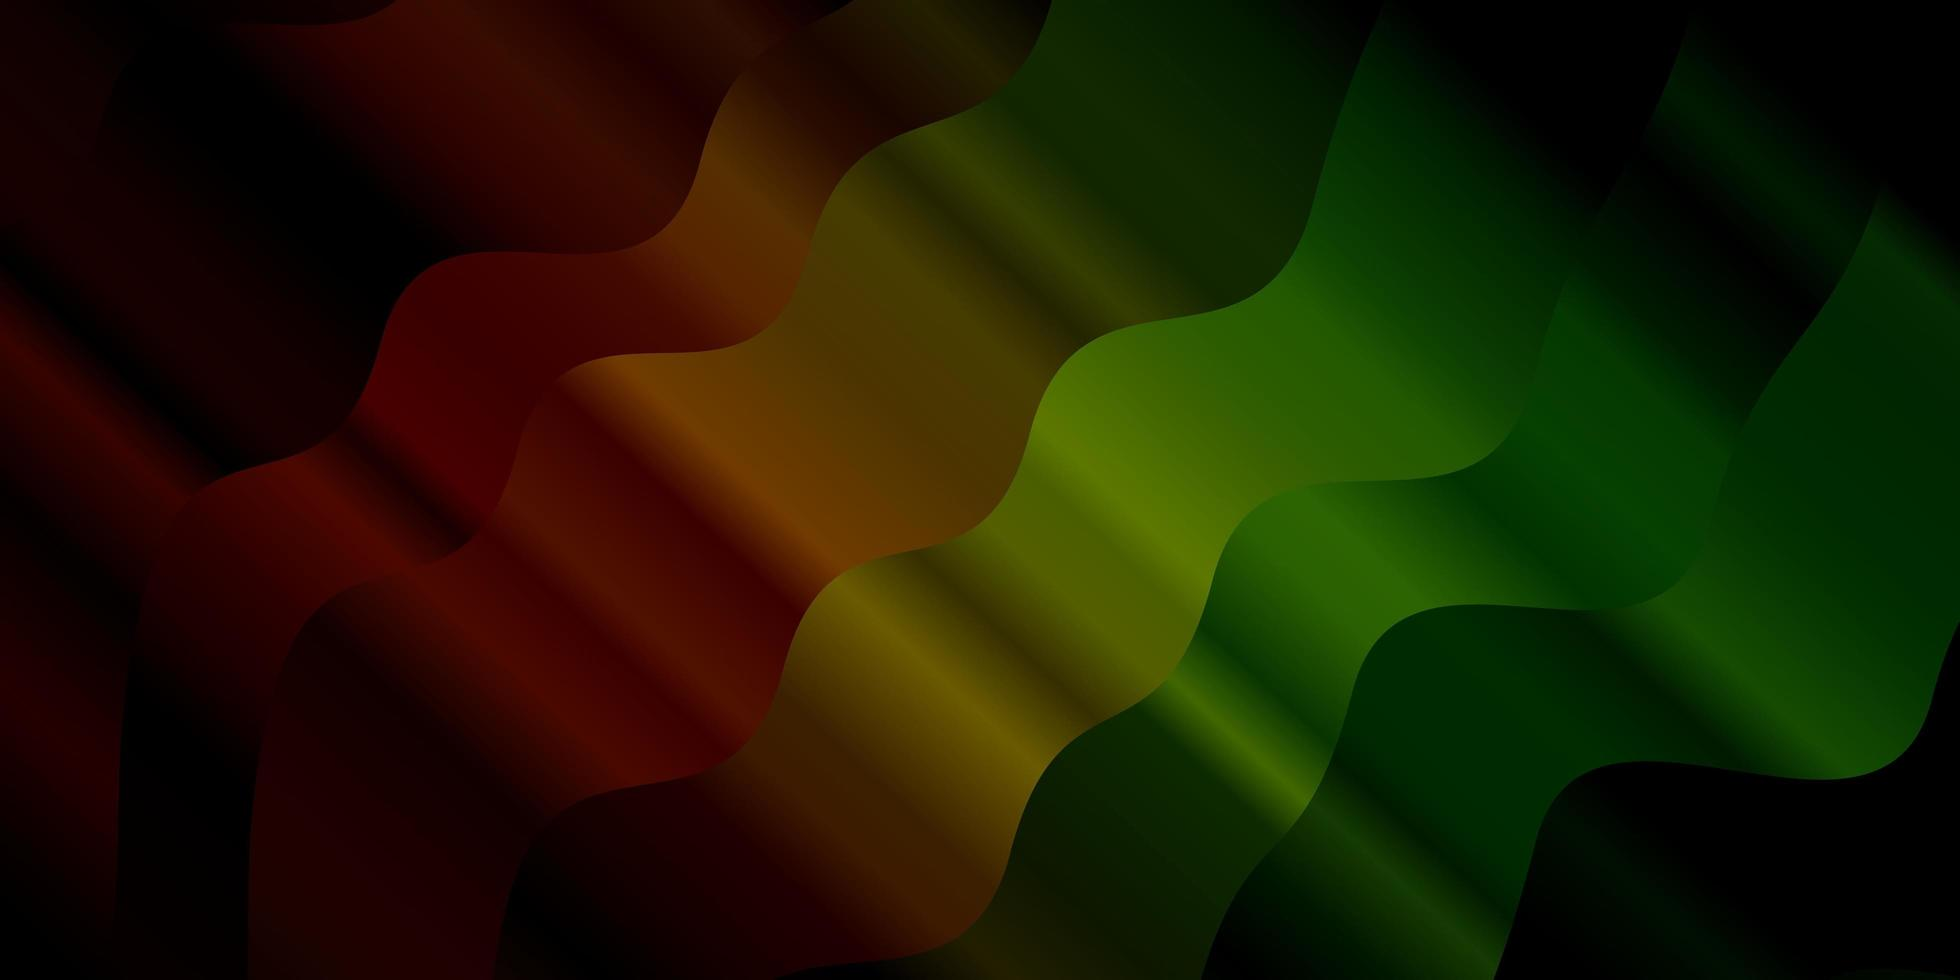 verde scuro, tessitura rossa con curve. vettore